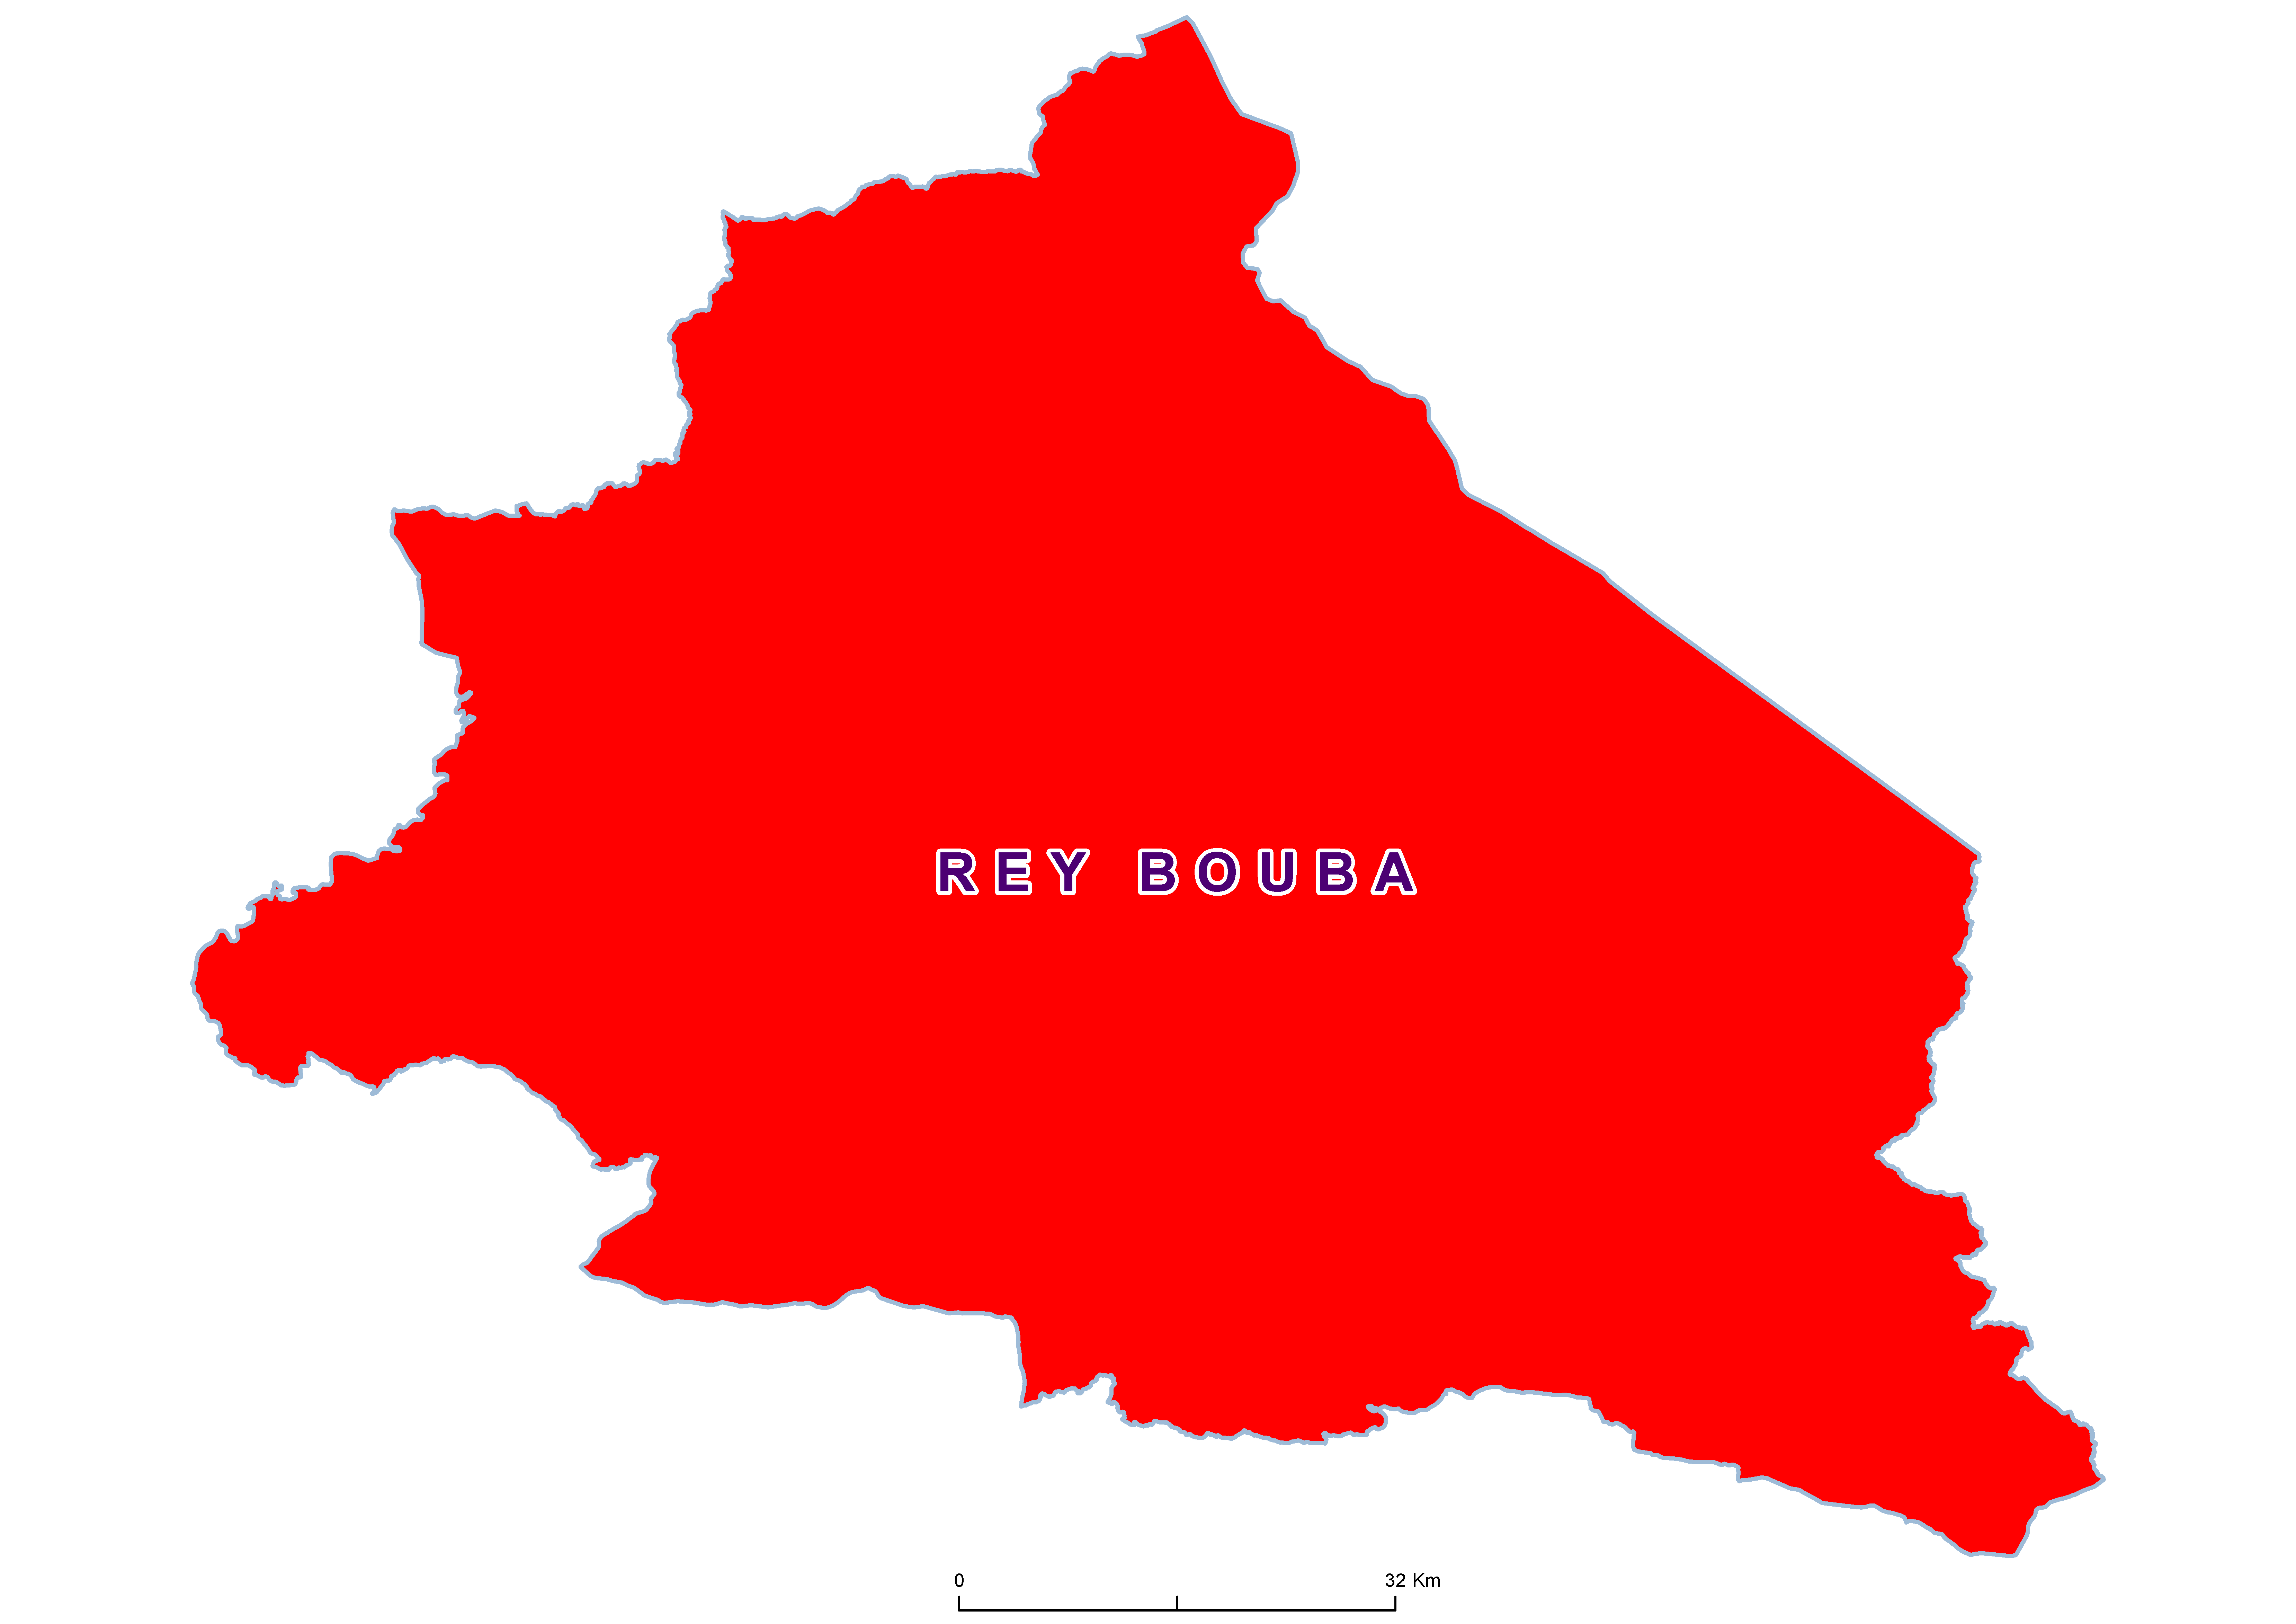 Rey bouba Max SCH 19850001